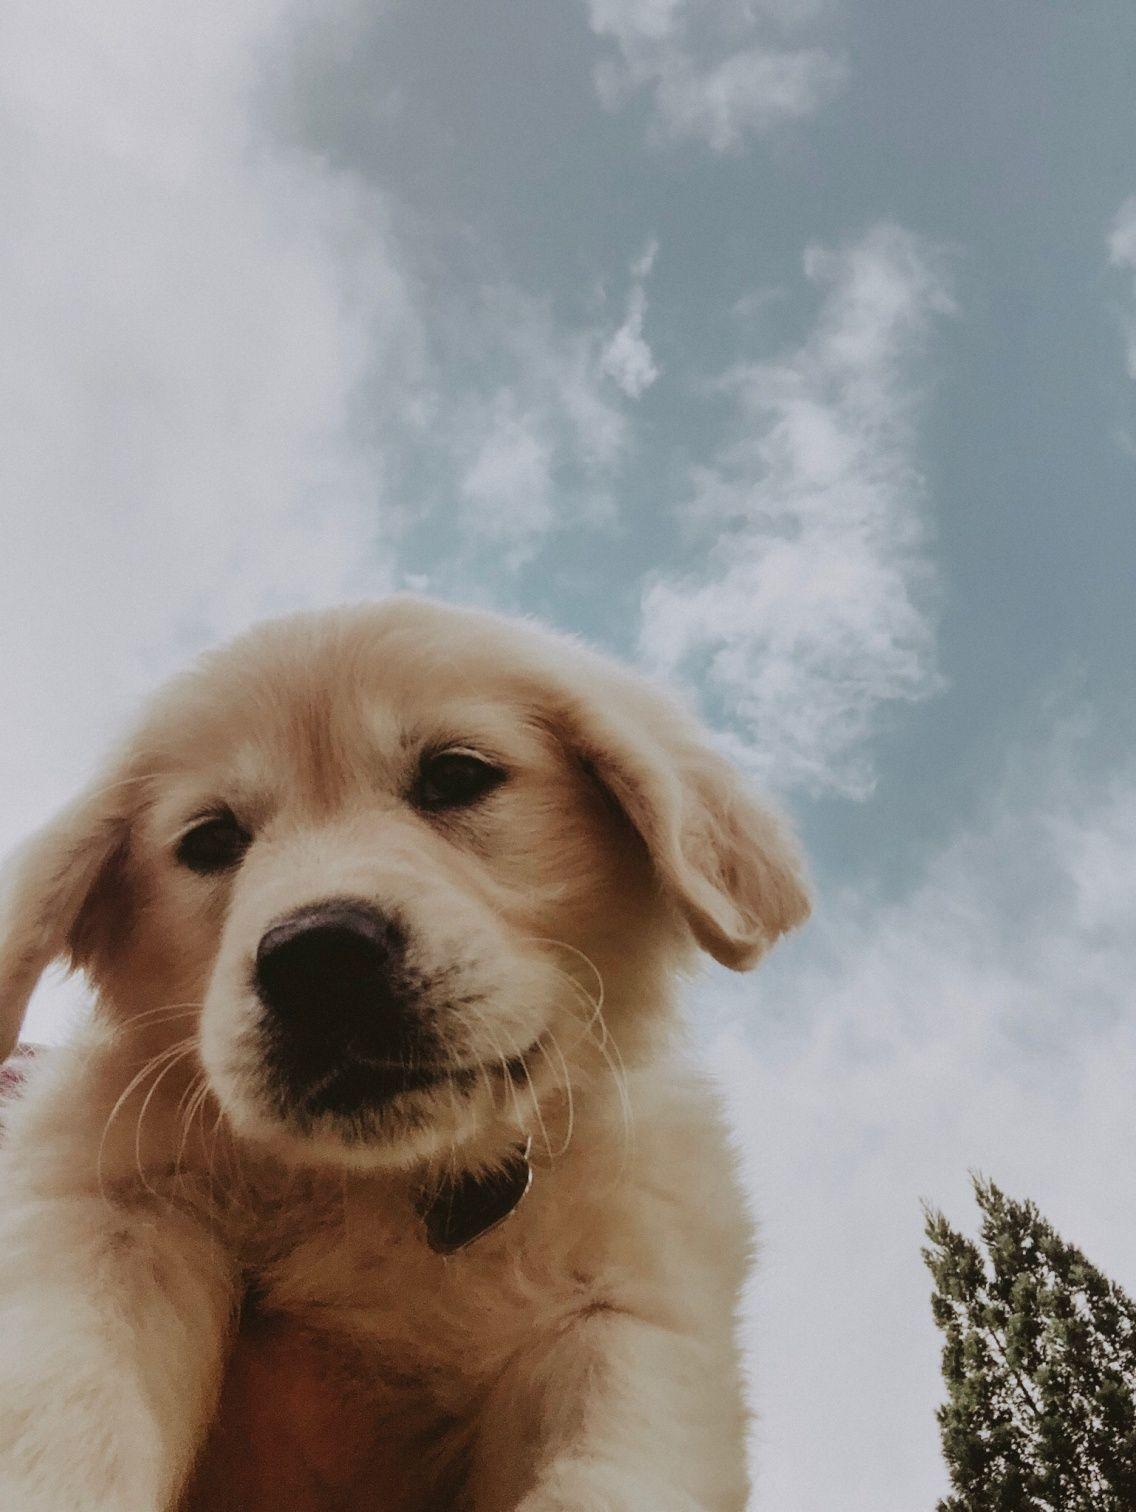 Vsco Selfie Loganbott Cute Dog Wallpaper Cute Dog Pictures Cute Puppy Wallpaper